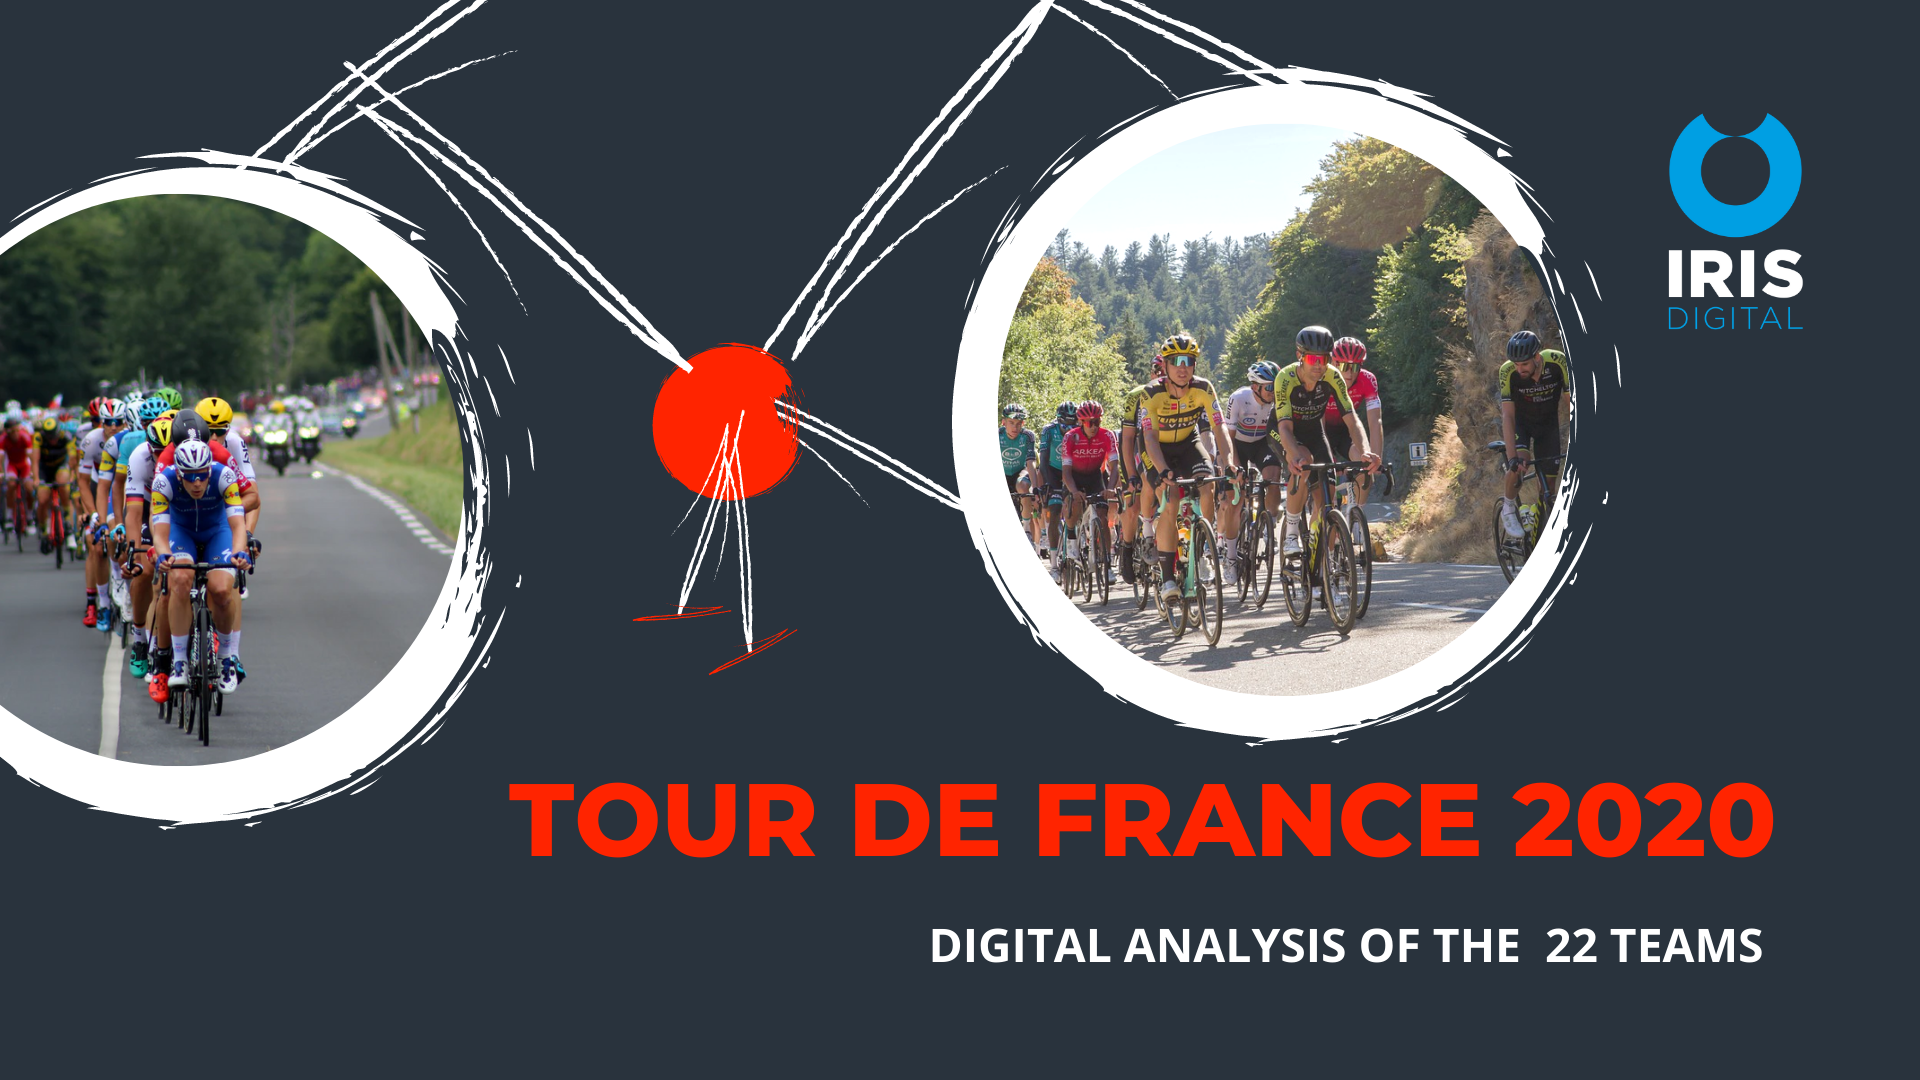 IRIS_Sports_Cycling_Teams_Digital_Fitness_Check